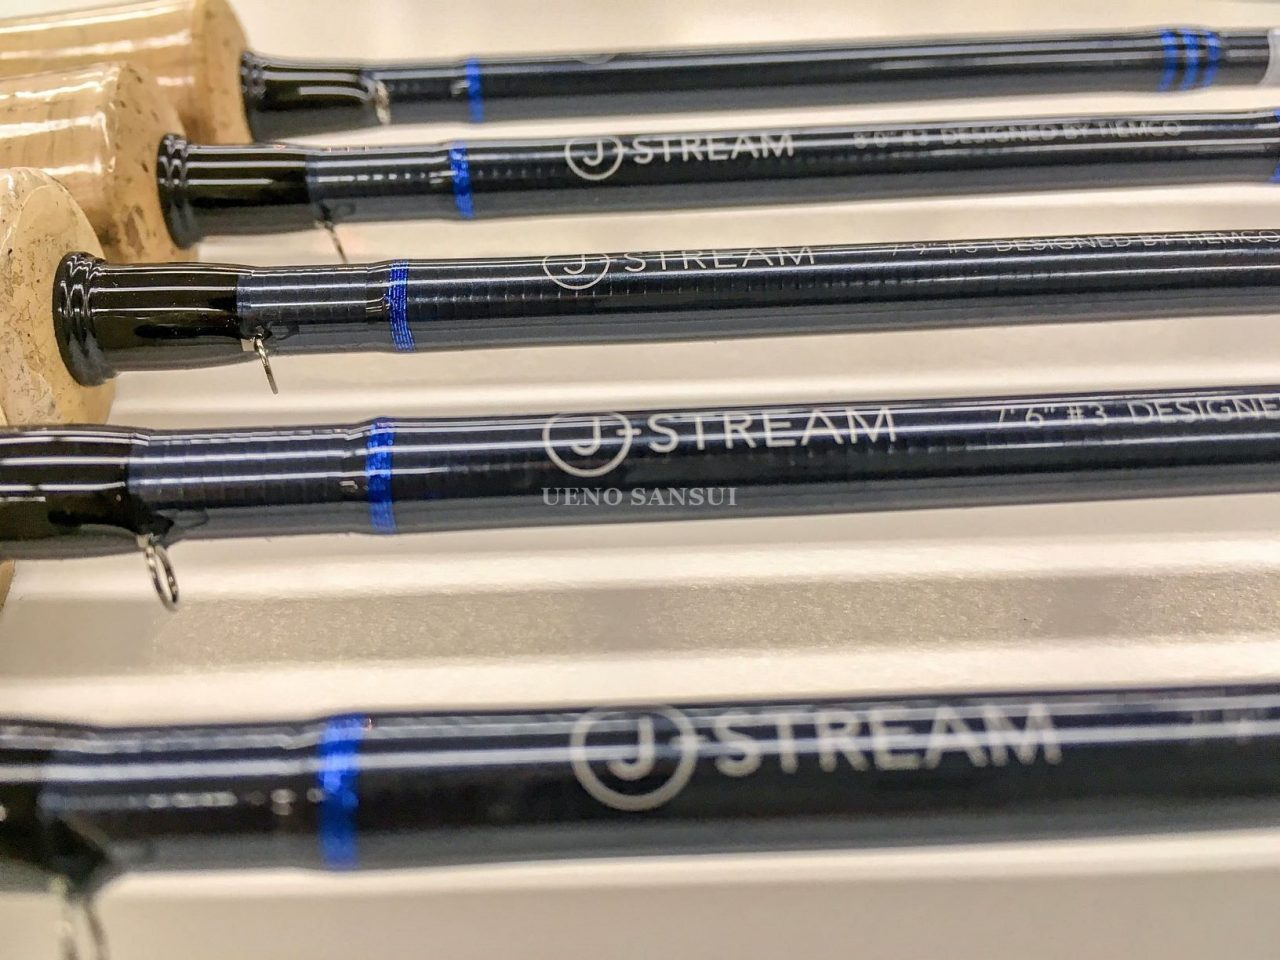 jstream01_1